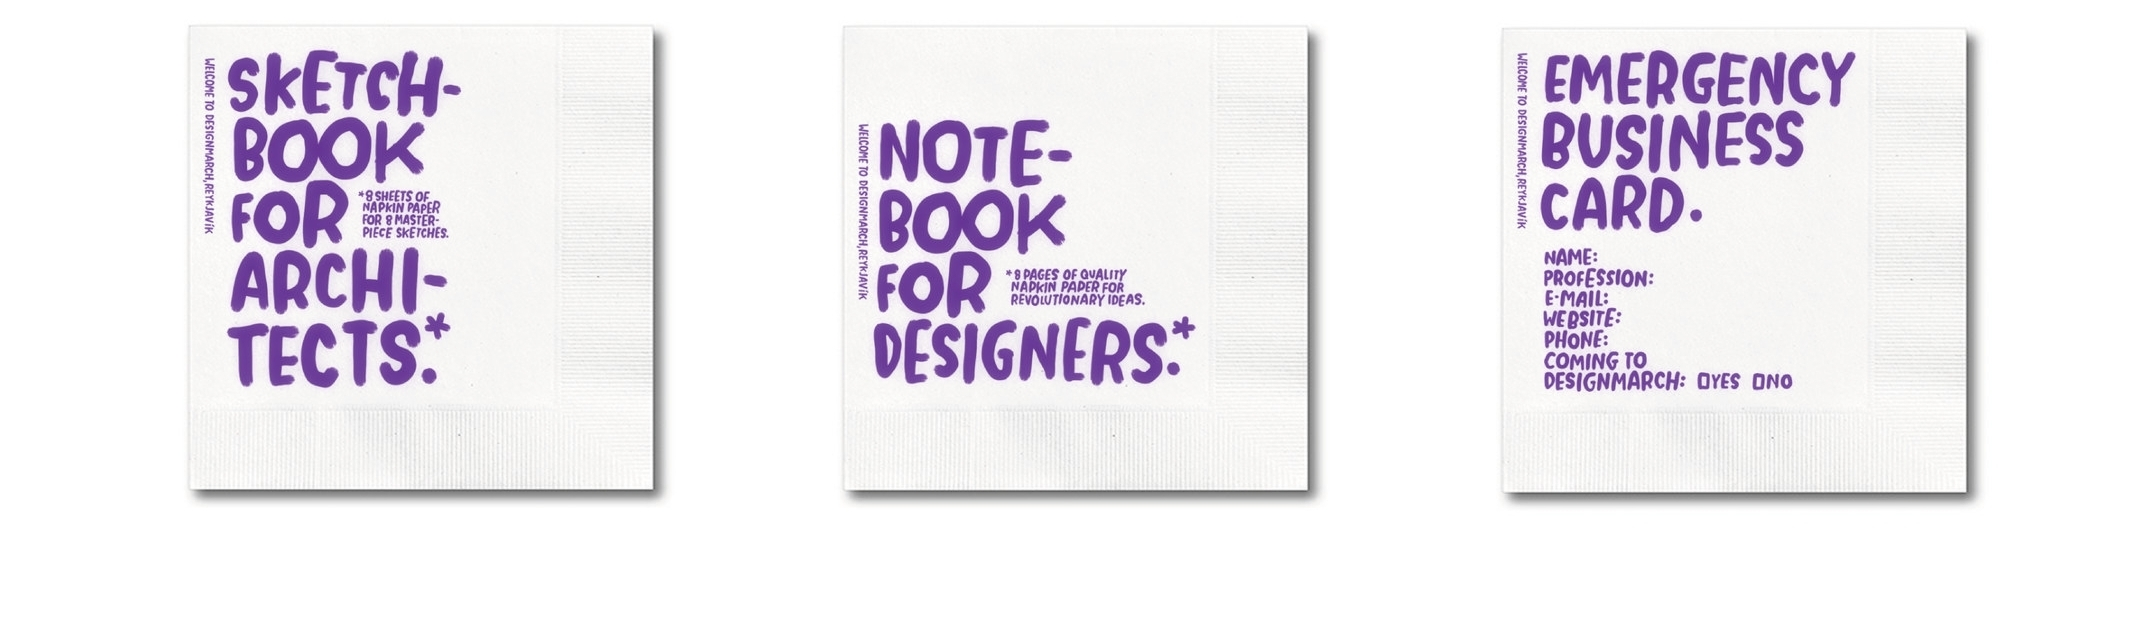 Design+a+March+brand+identity+ +tomasdottir.+ +logo+design,+pattern+design,+online+marketing,+festival+design,+branding,+illustration,+modern,+napkins+design